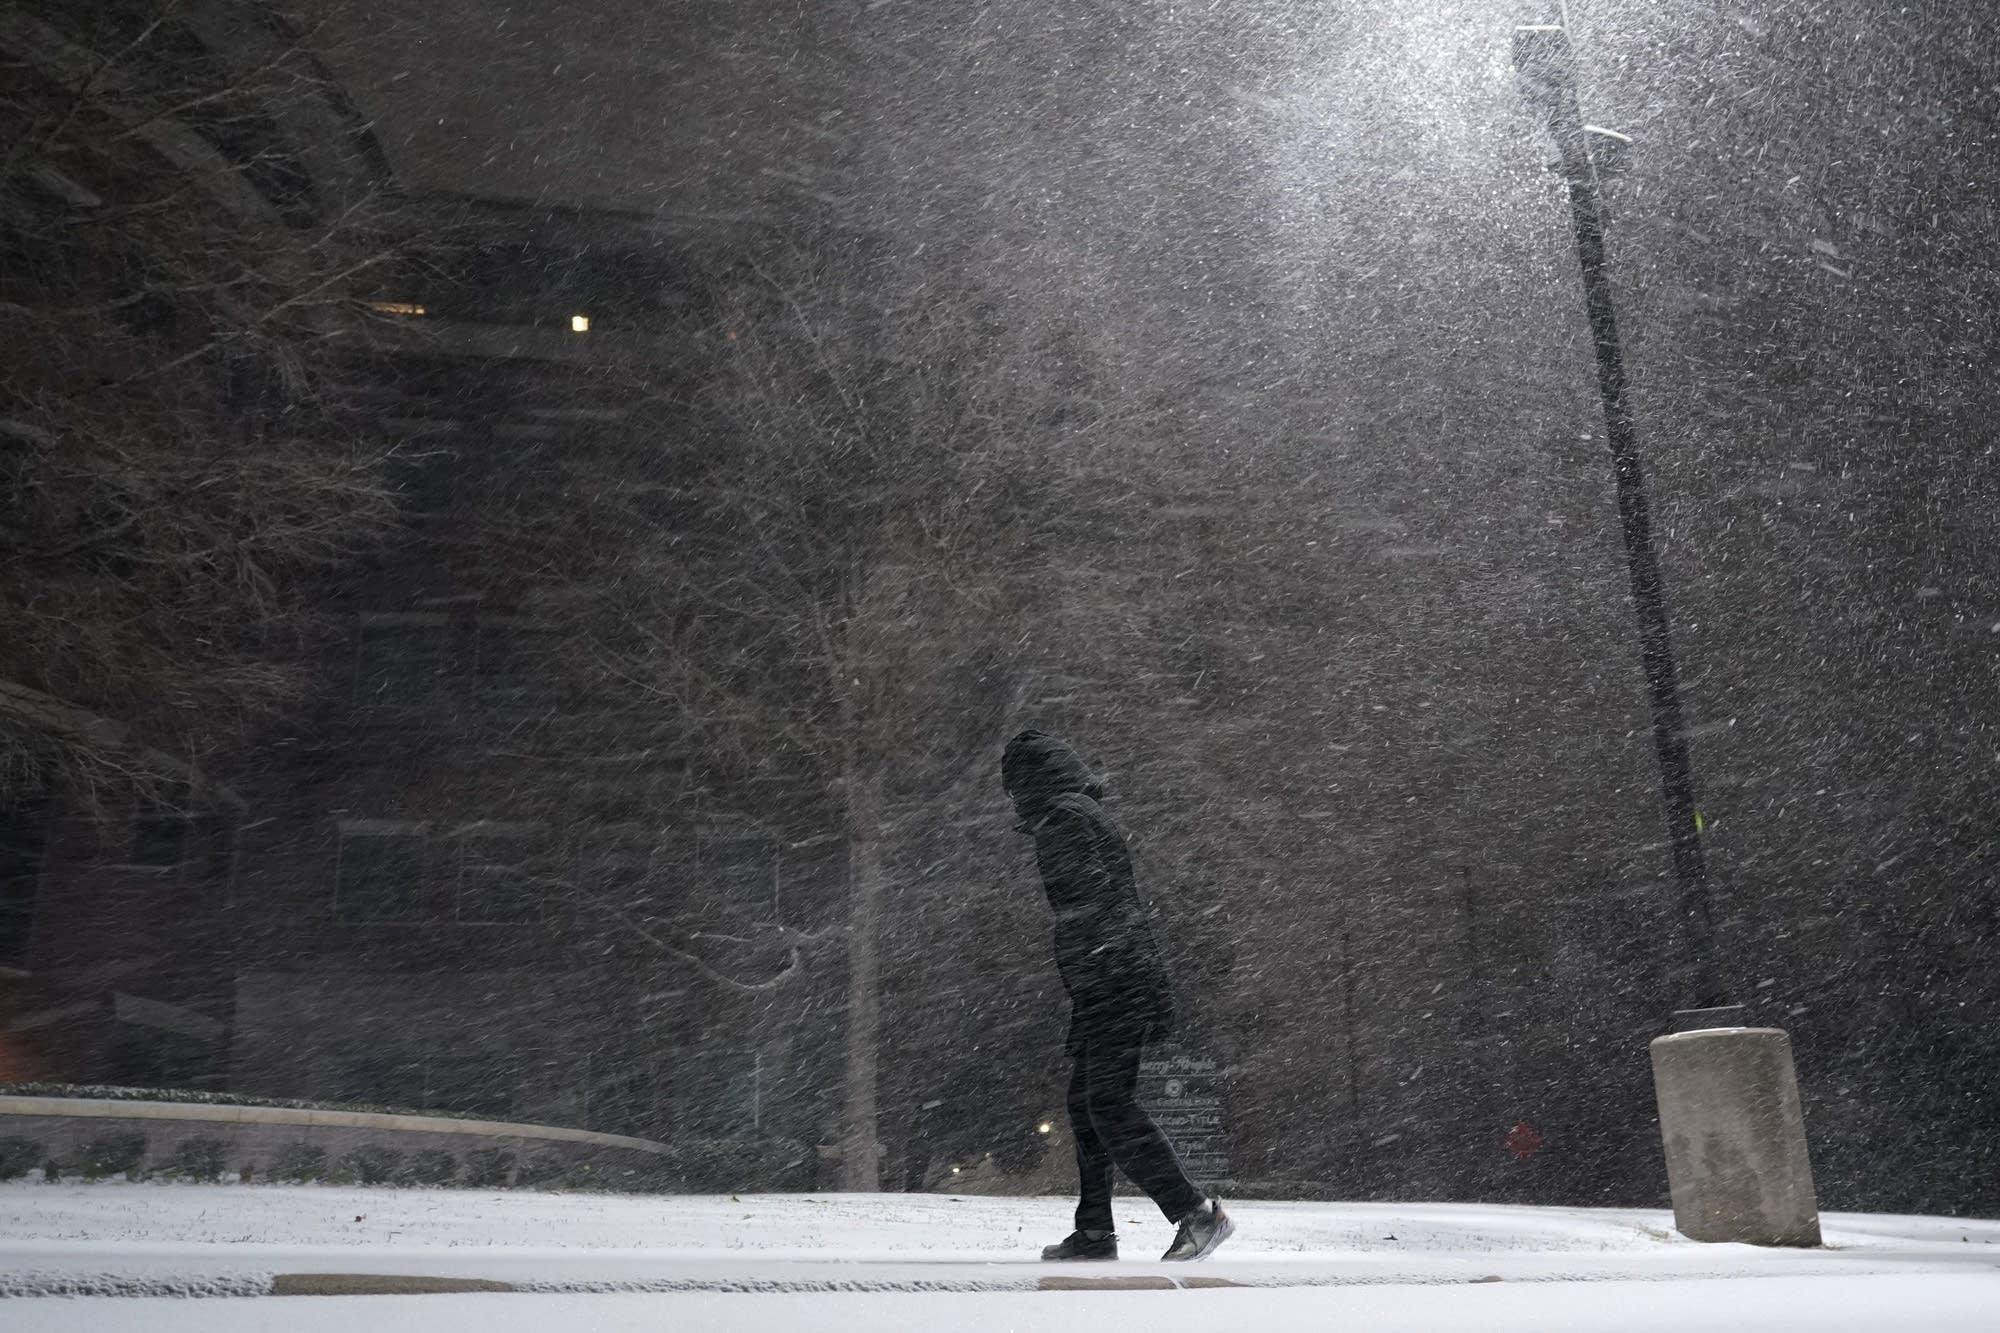 A woman walks through falling snow.